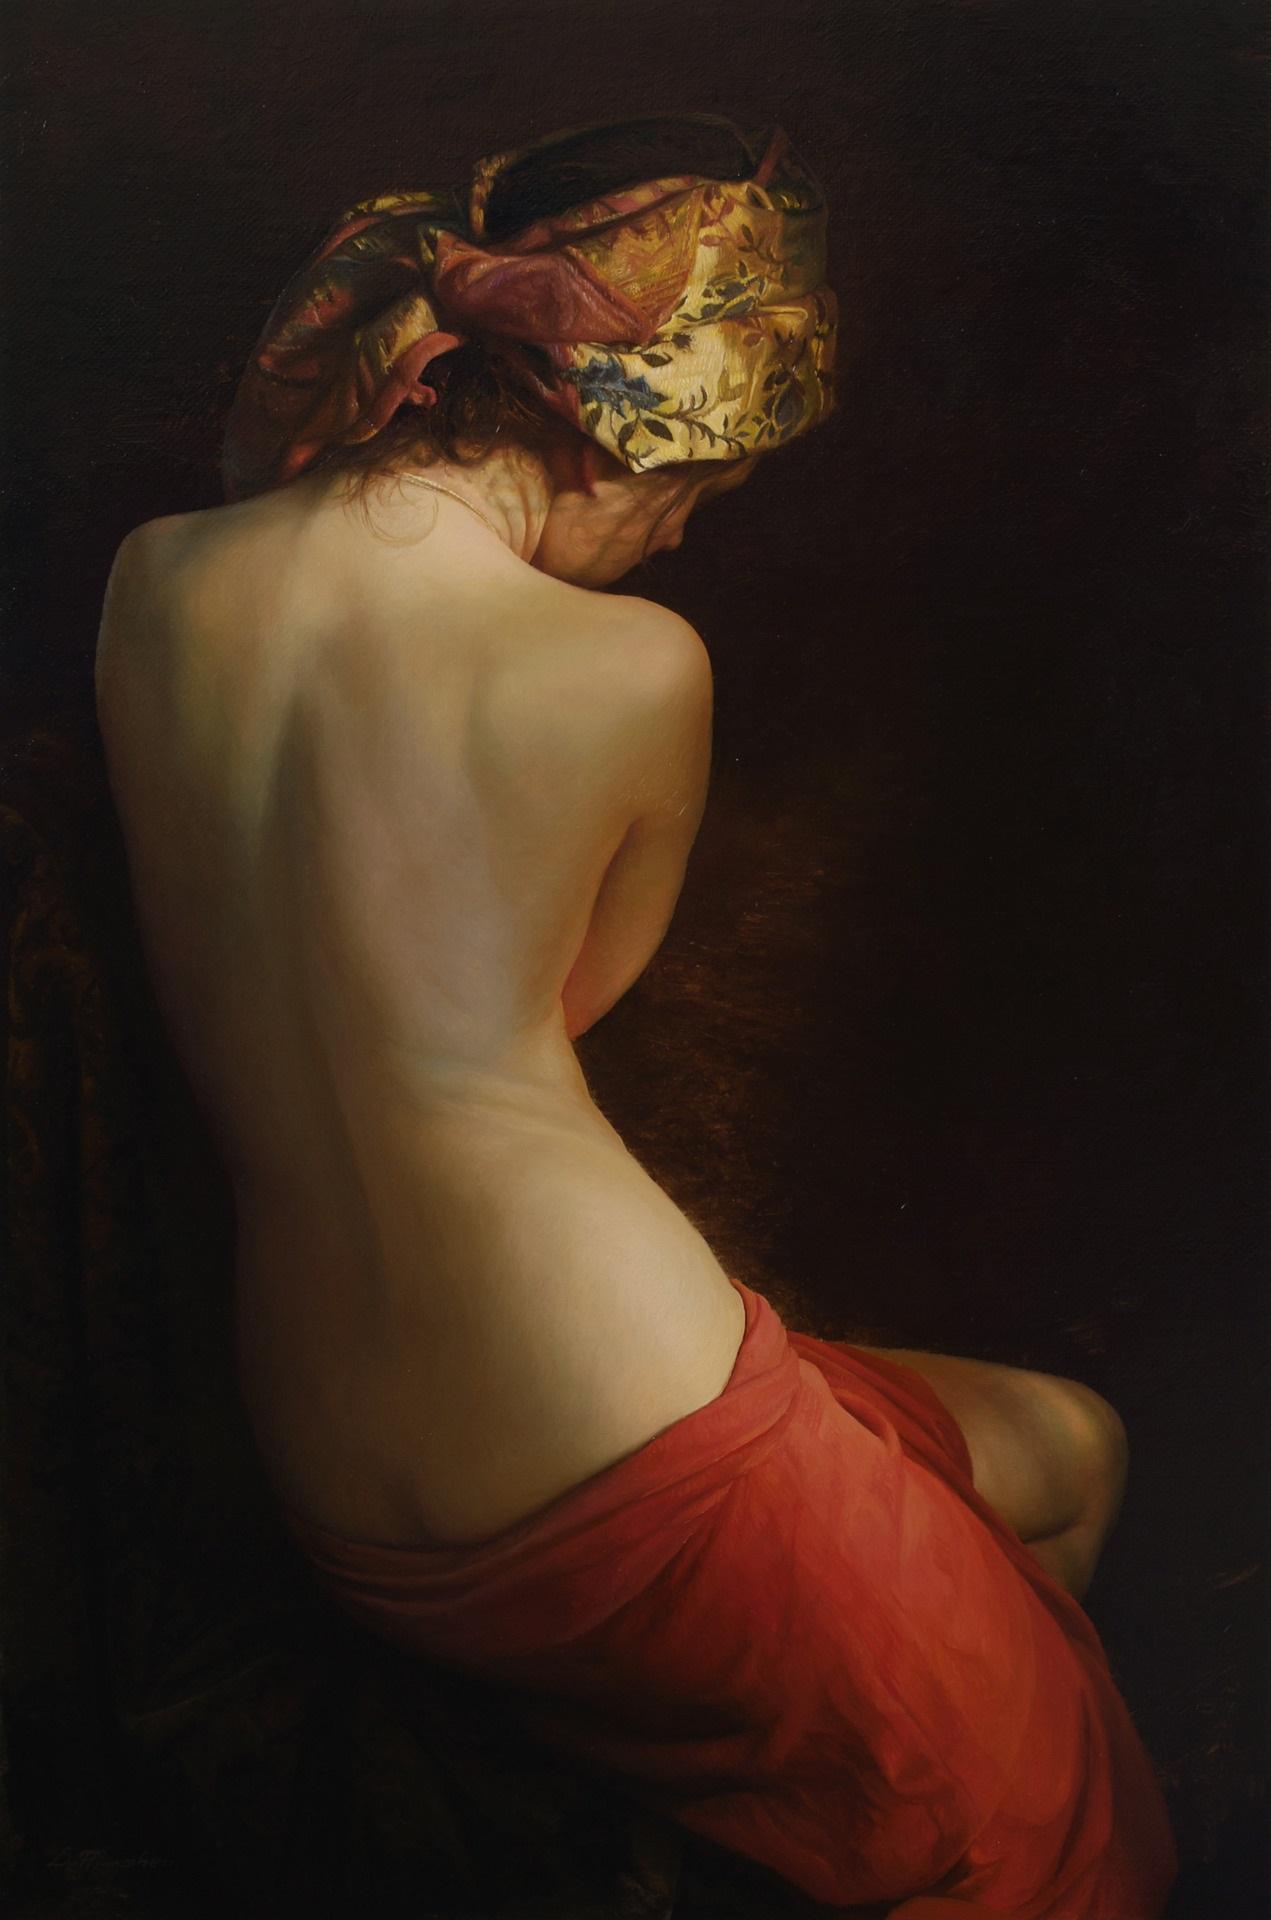 Women's images by a Russian realist artist Sergey Marshennikov - 15